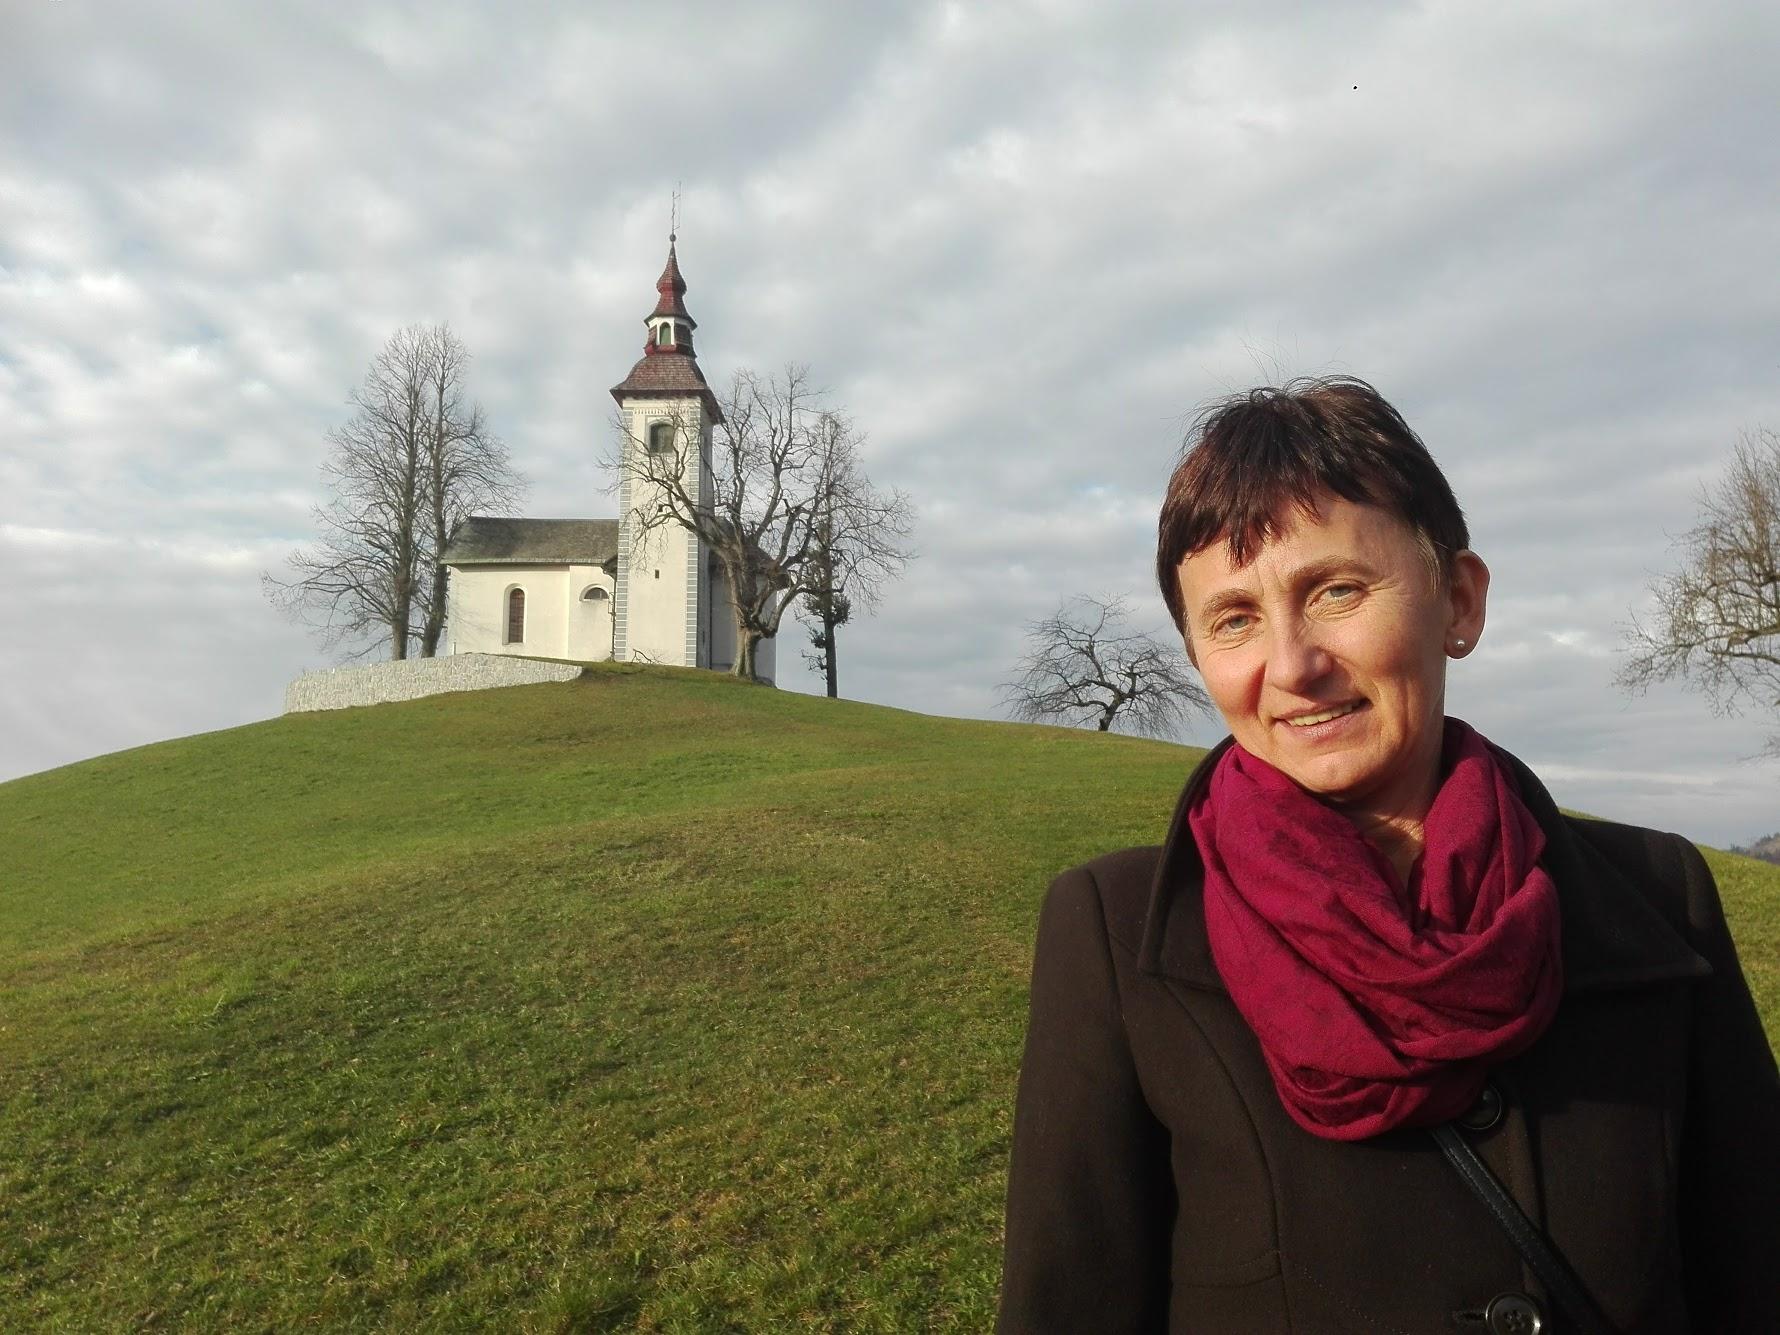 Milena Kepic